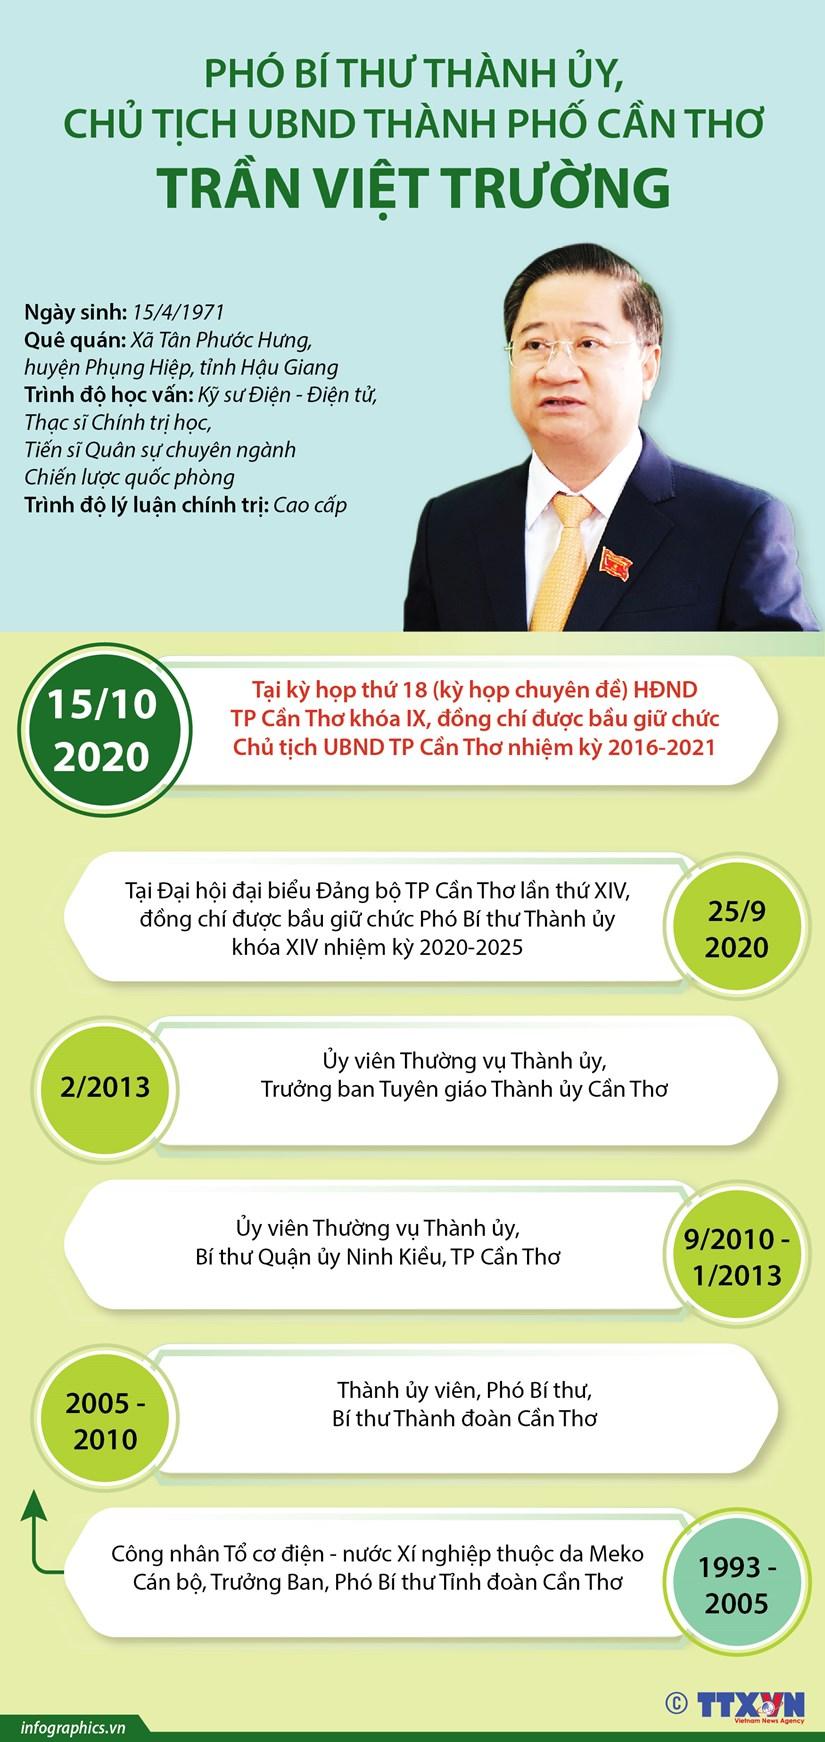 [Infographics] Chu tich UBND thanh pho Can Tho Tran Viet Truong hinh anh 1